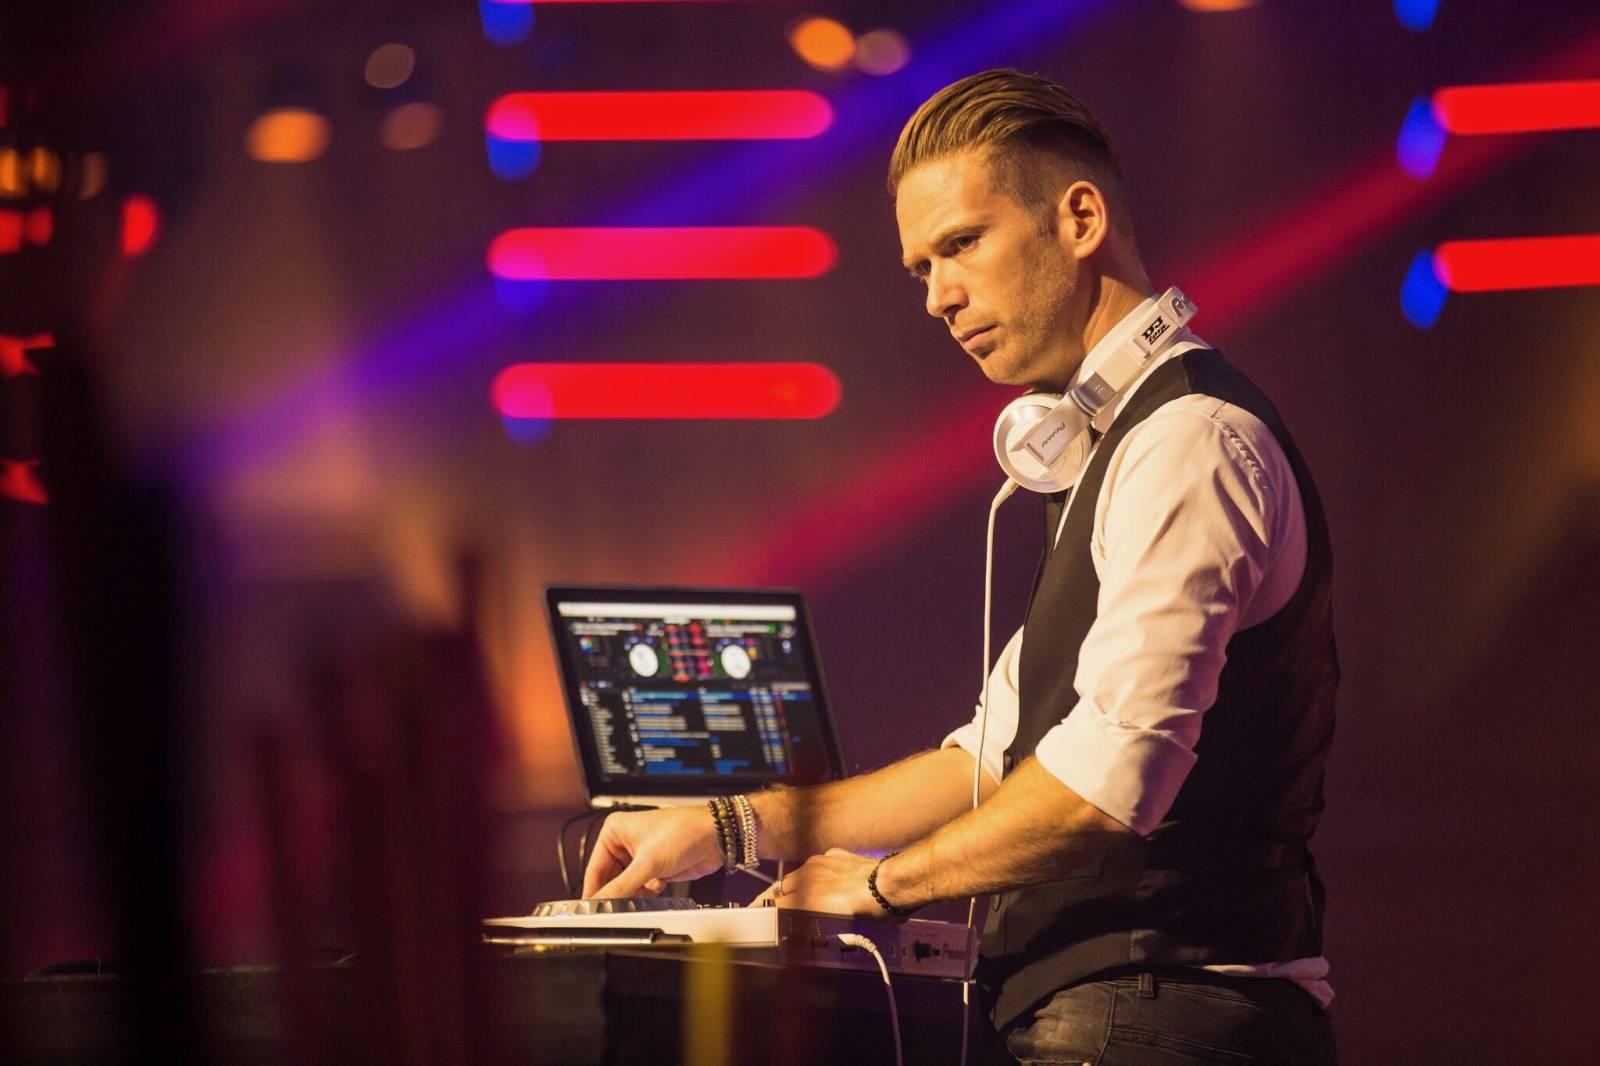 DJ TOM - Dj - House of Events - 8